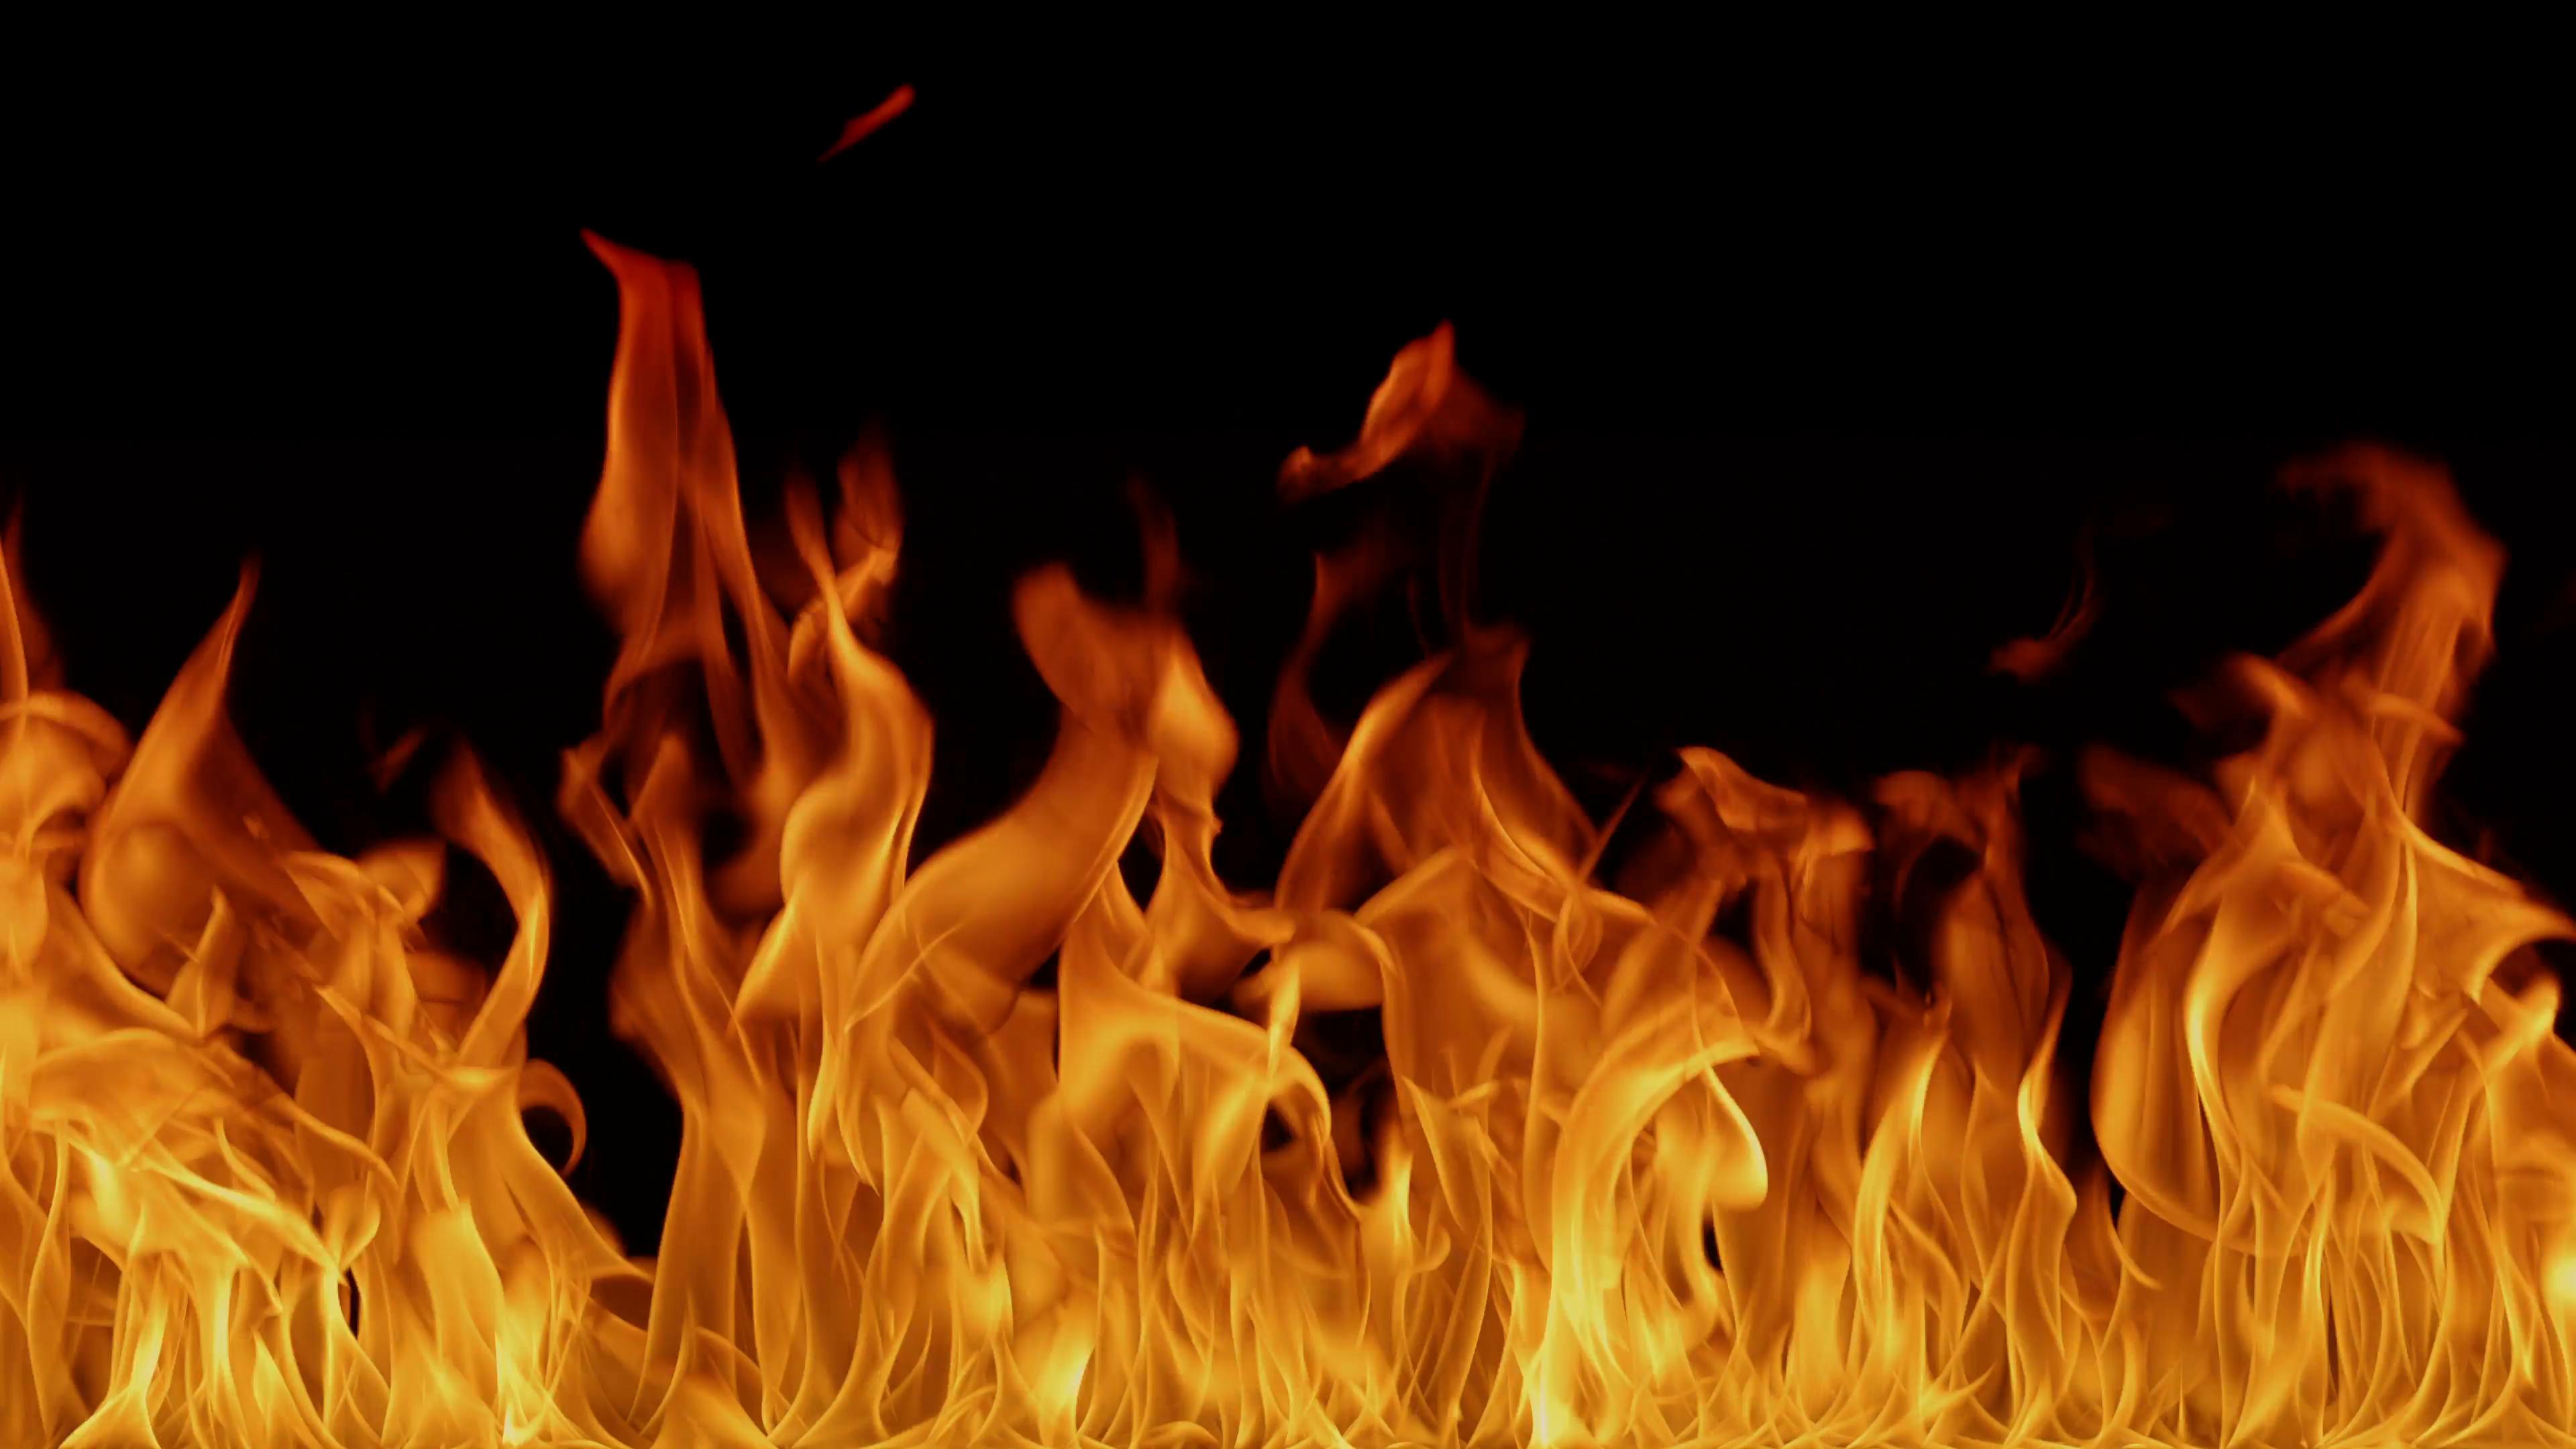 Hell inferno fire background Fire burn hot witchcraft video art 3840x2160